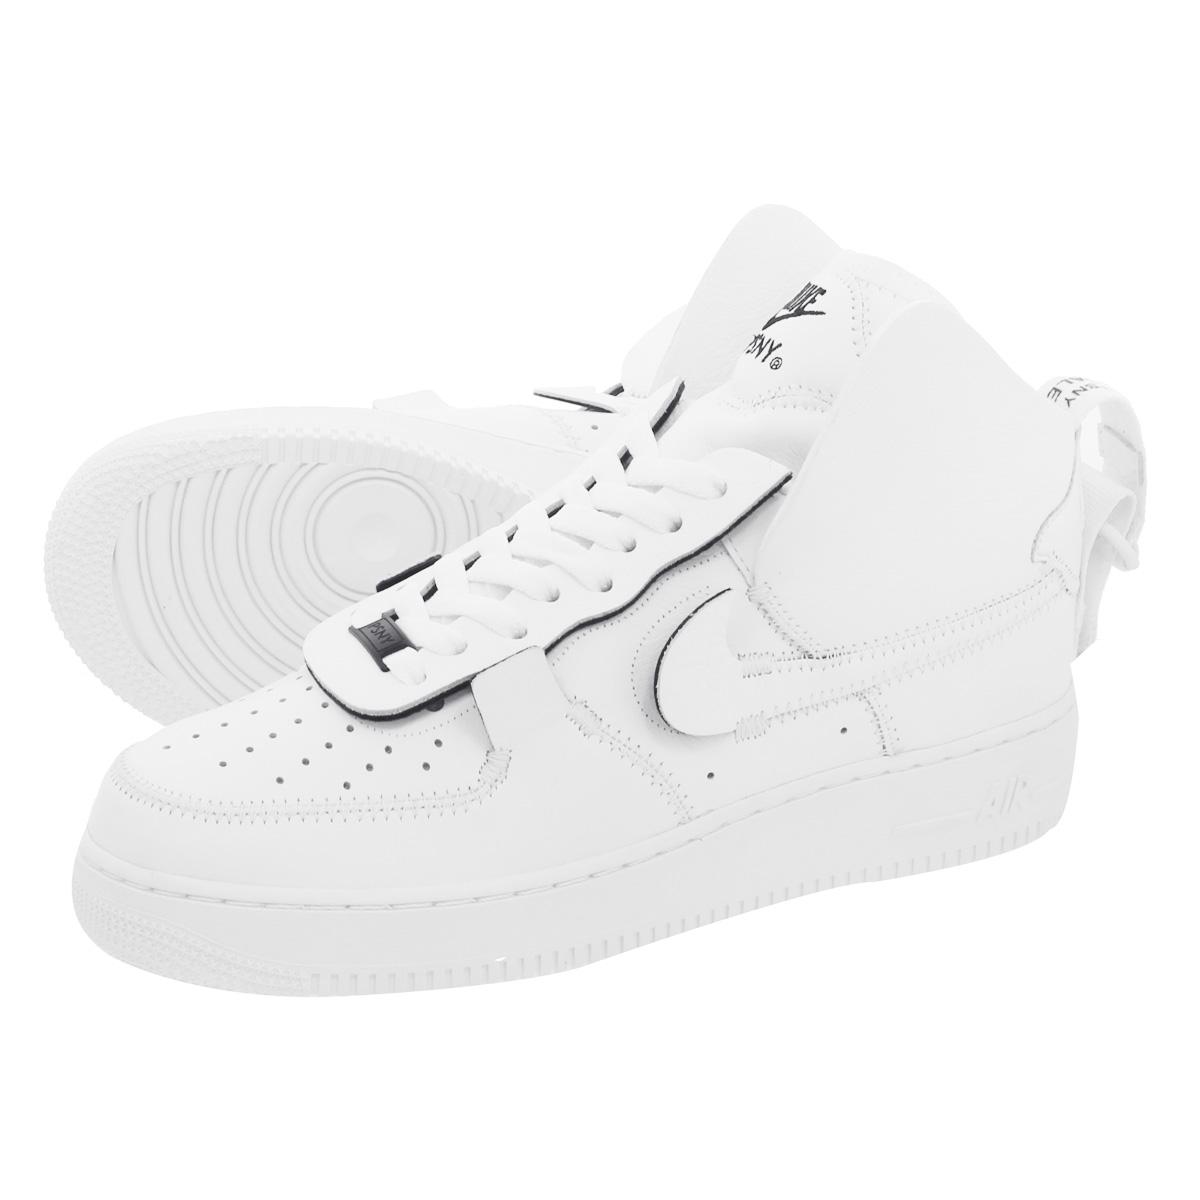 026542e3b9f9fc NIKE X PSNY AIR FORCE 1 HIGH Nike X public school New York air force 1 high  WHITE WHITE ao9292-101